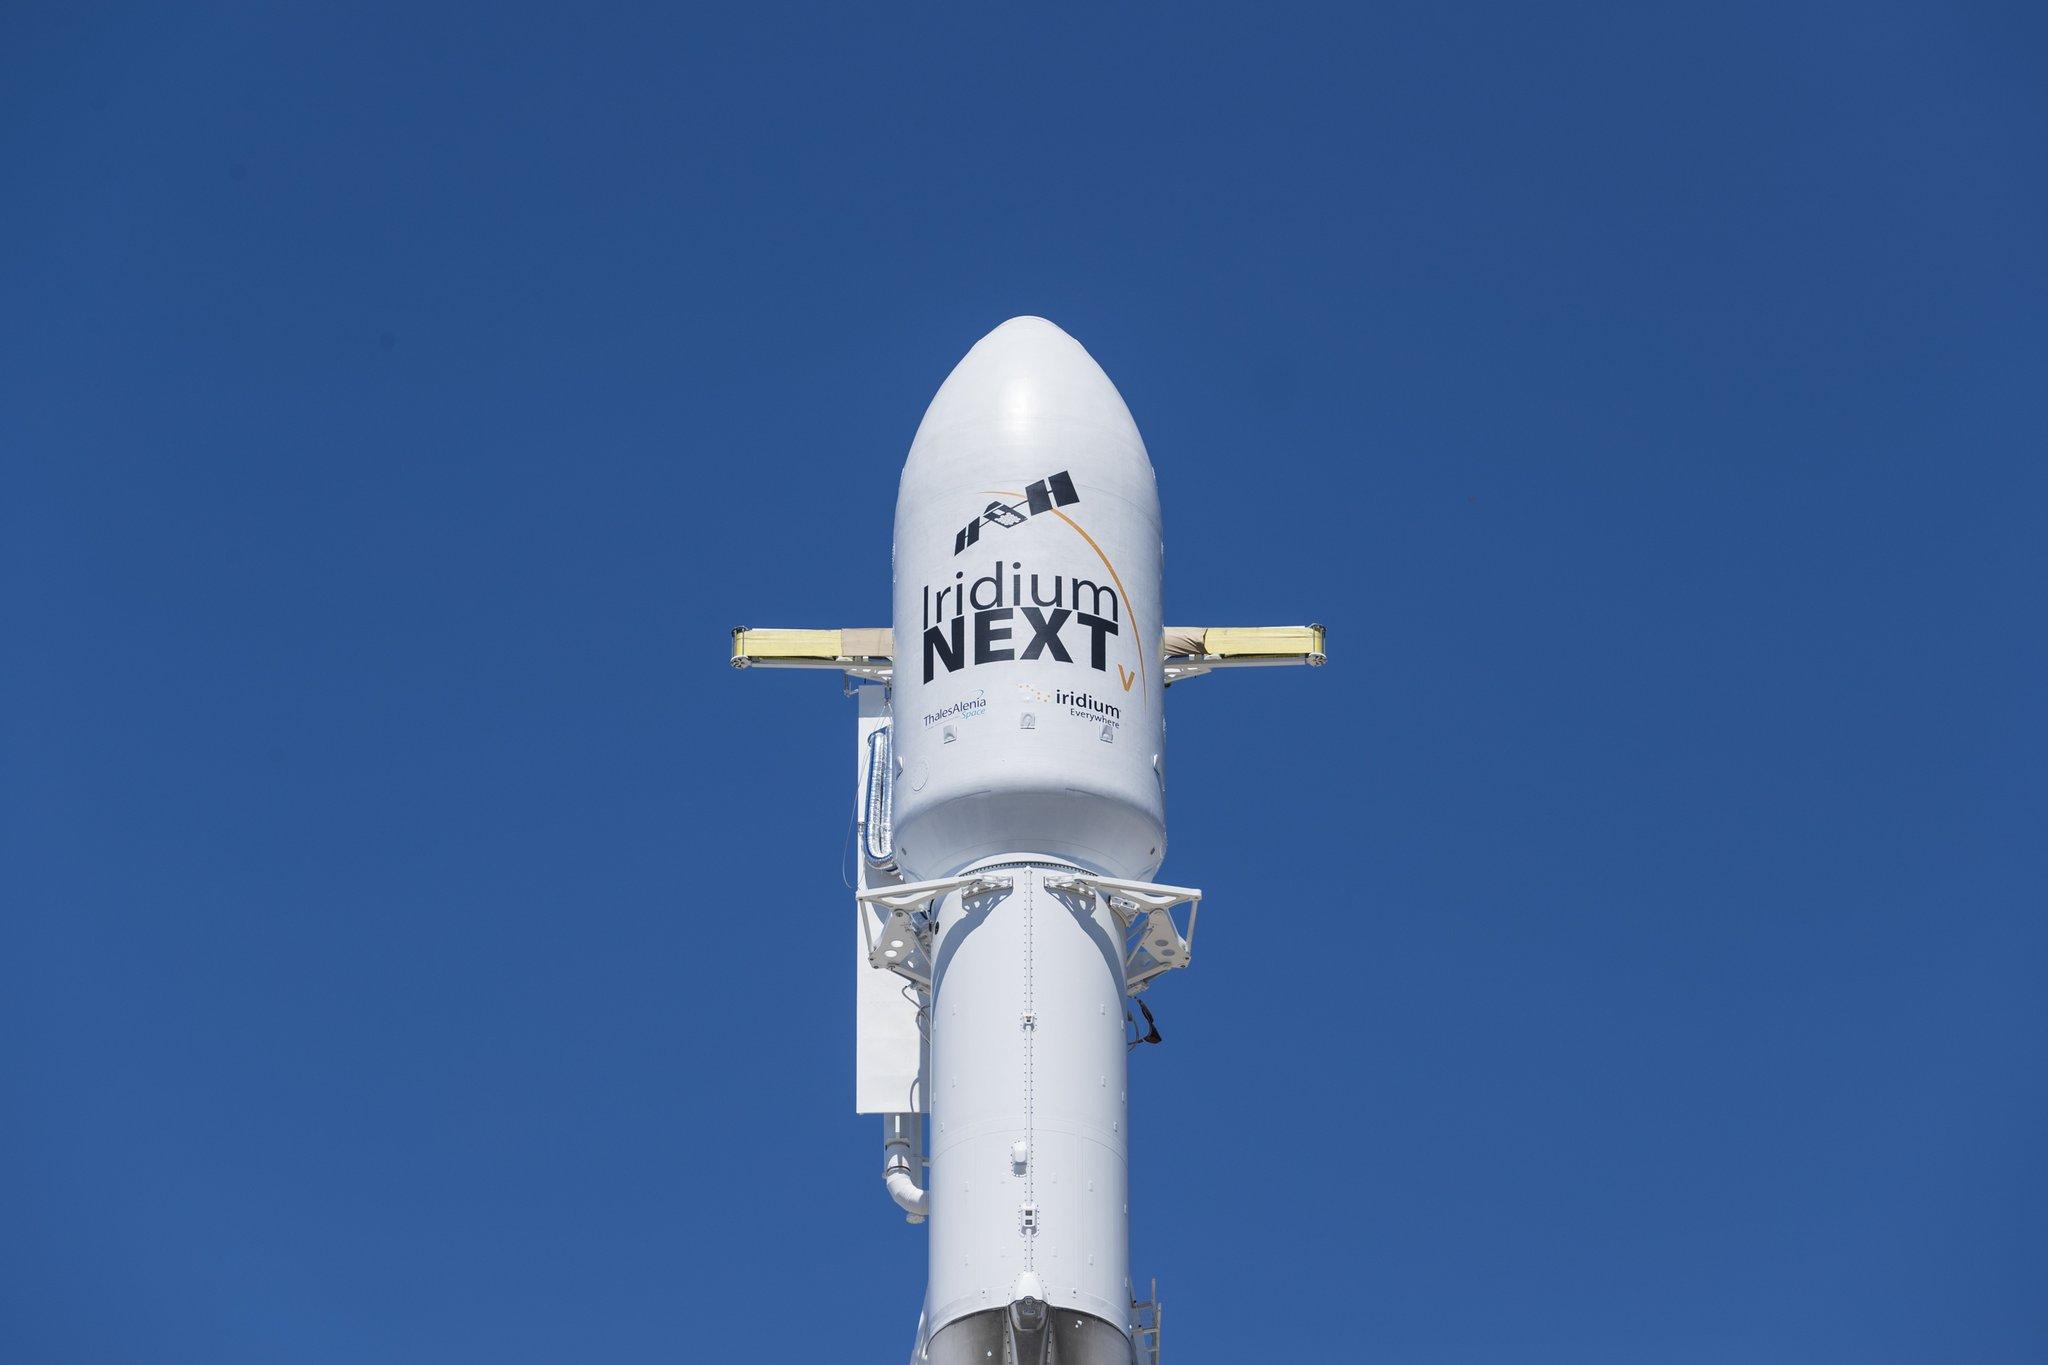 Falcon 9 со спутниками Iridium NEXT наборту готов кпуску.